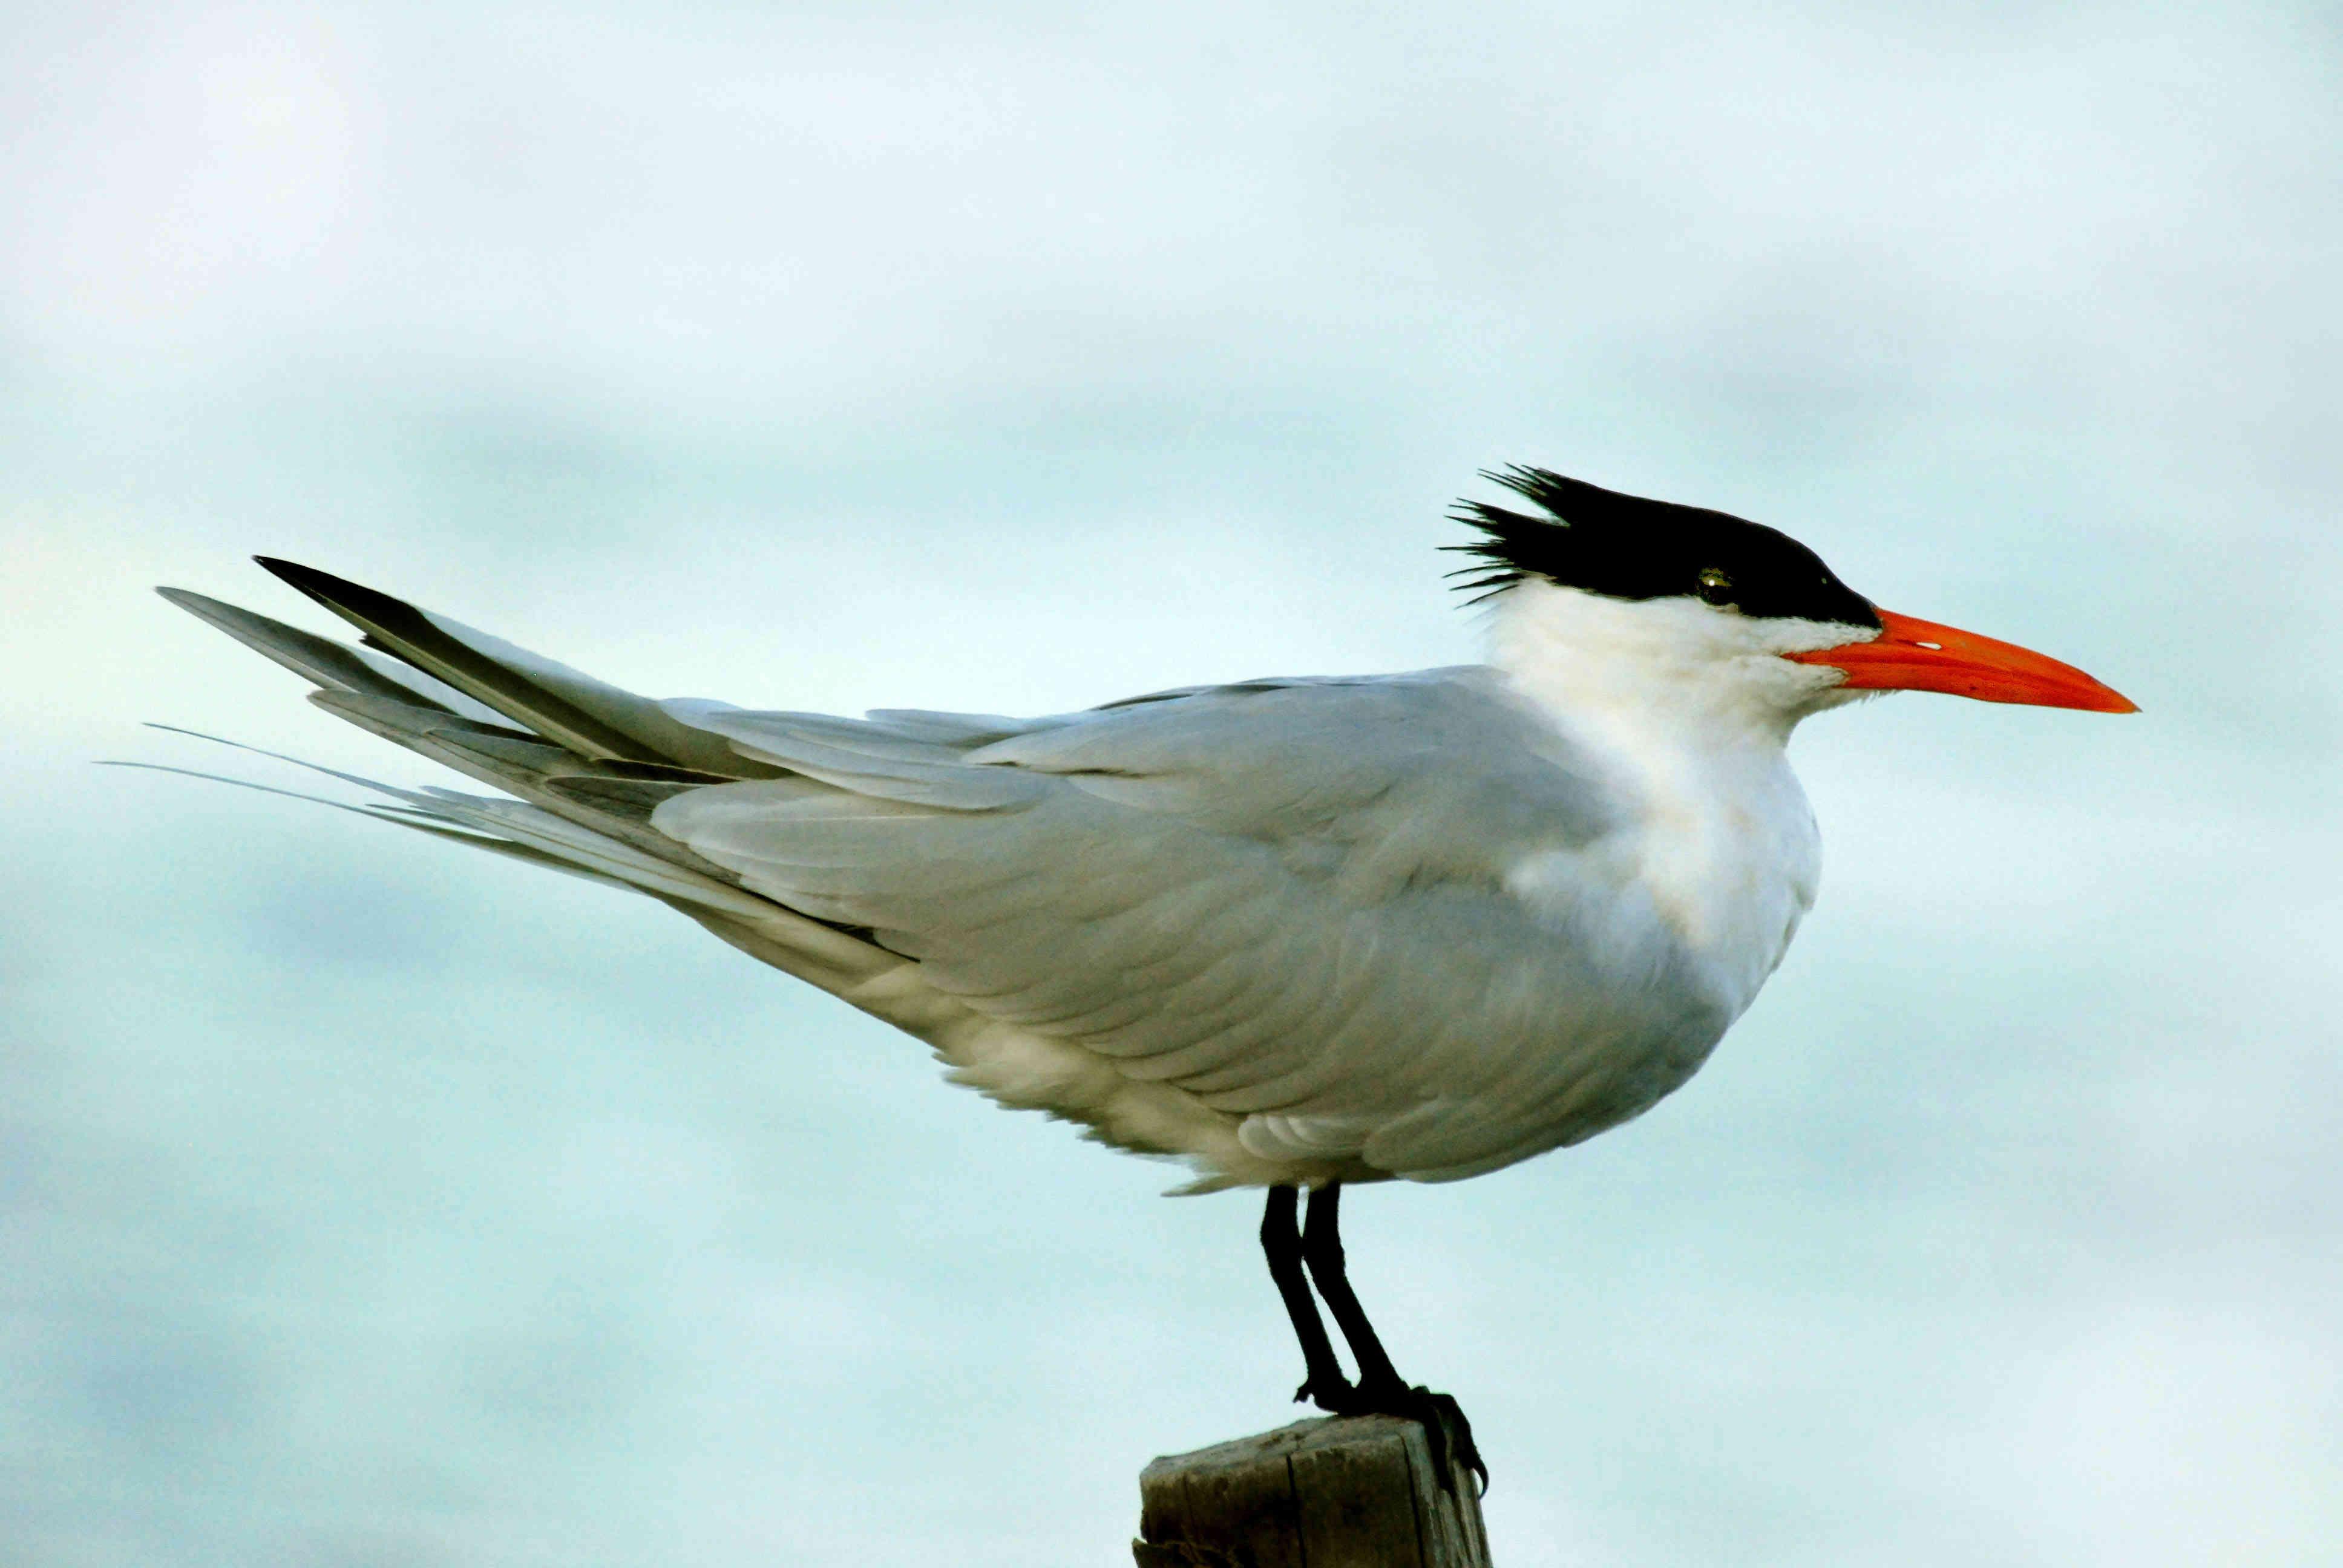 Royal Tern on Ambergris Caye - Ambergris Caye Belize Message Board